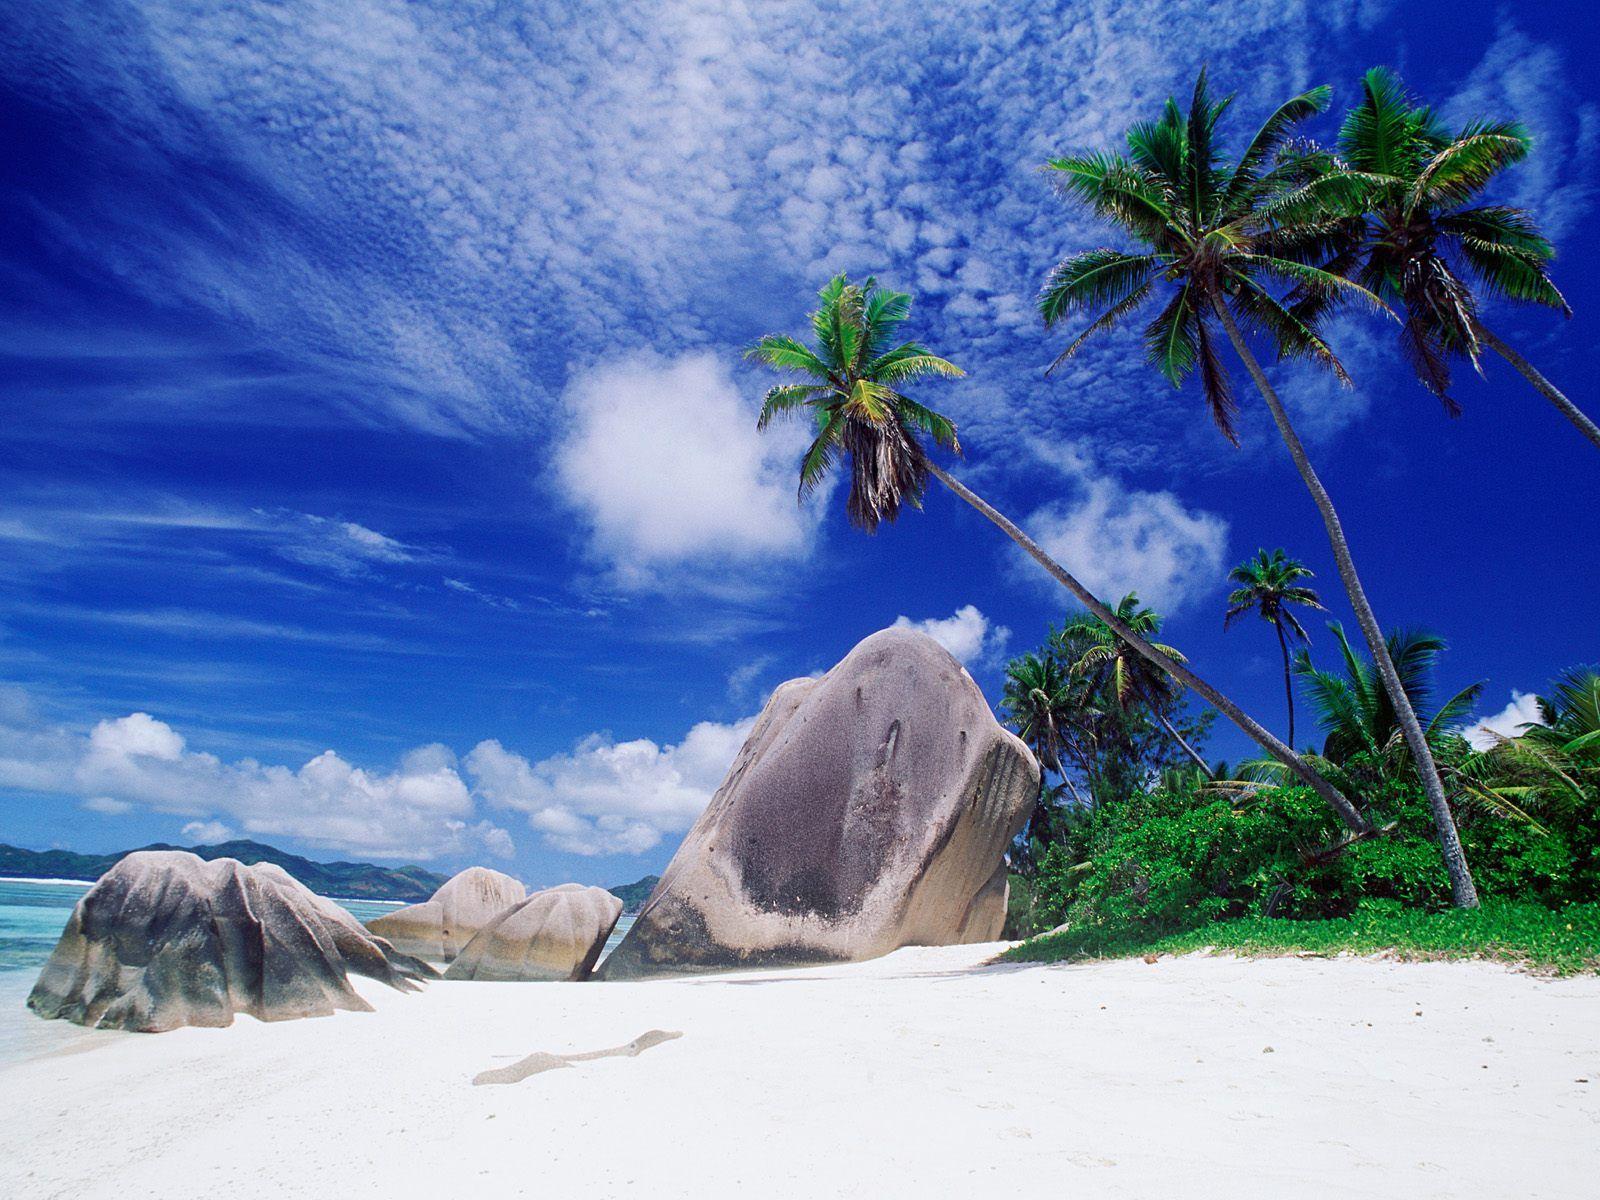 wallpaper backgrounds | Free HD Desktop Wallpaper Backgrounds | Oumbrella: sharing passion